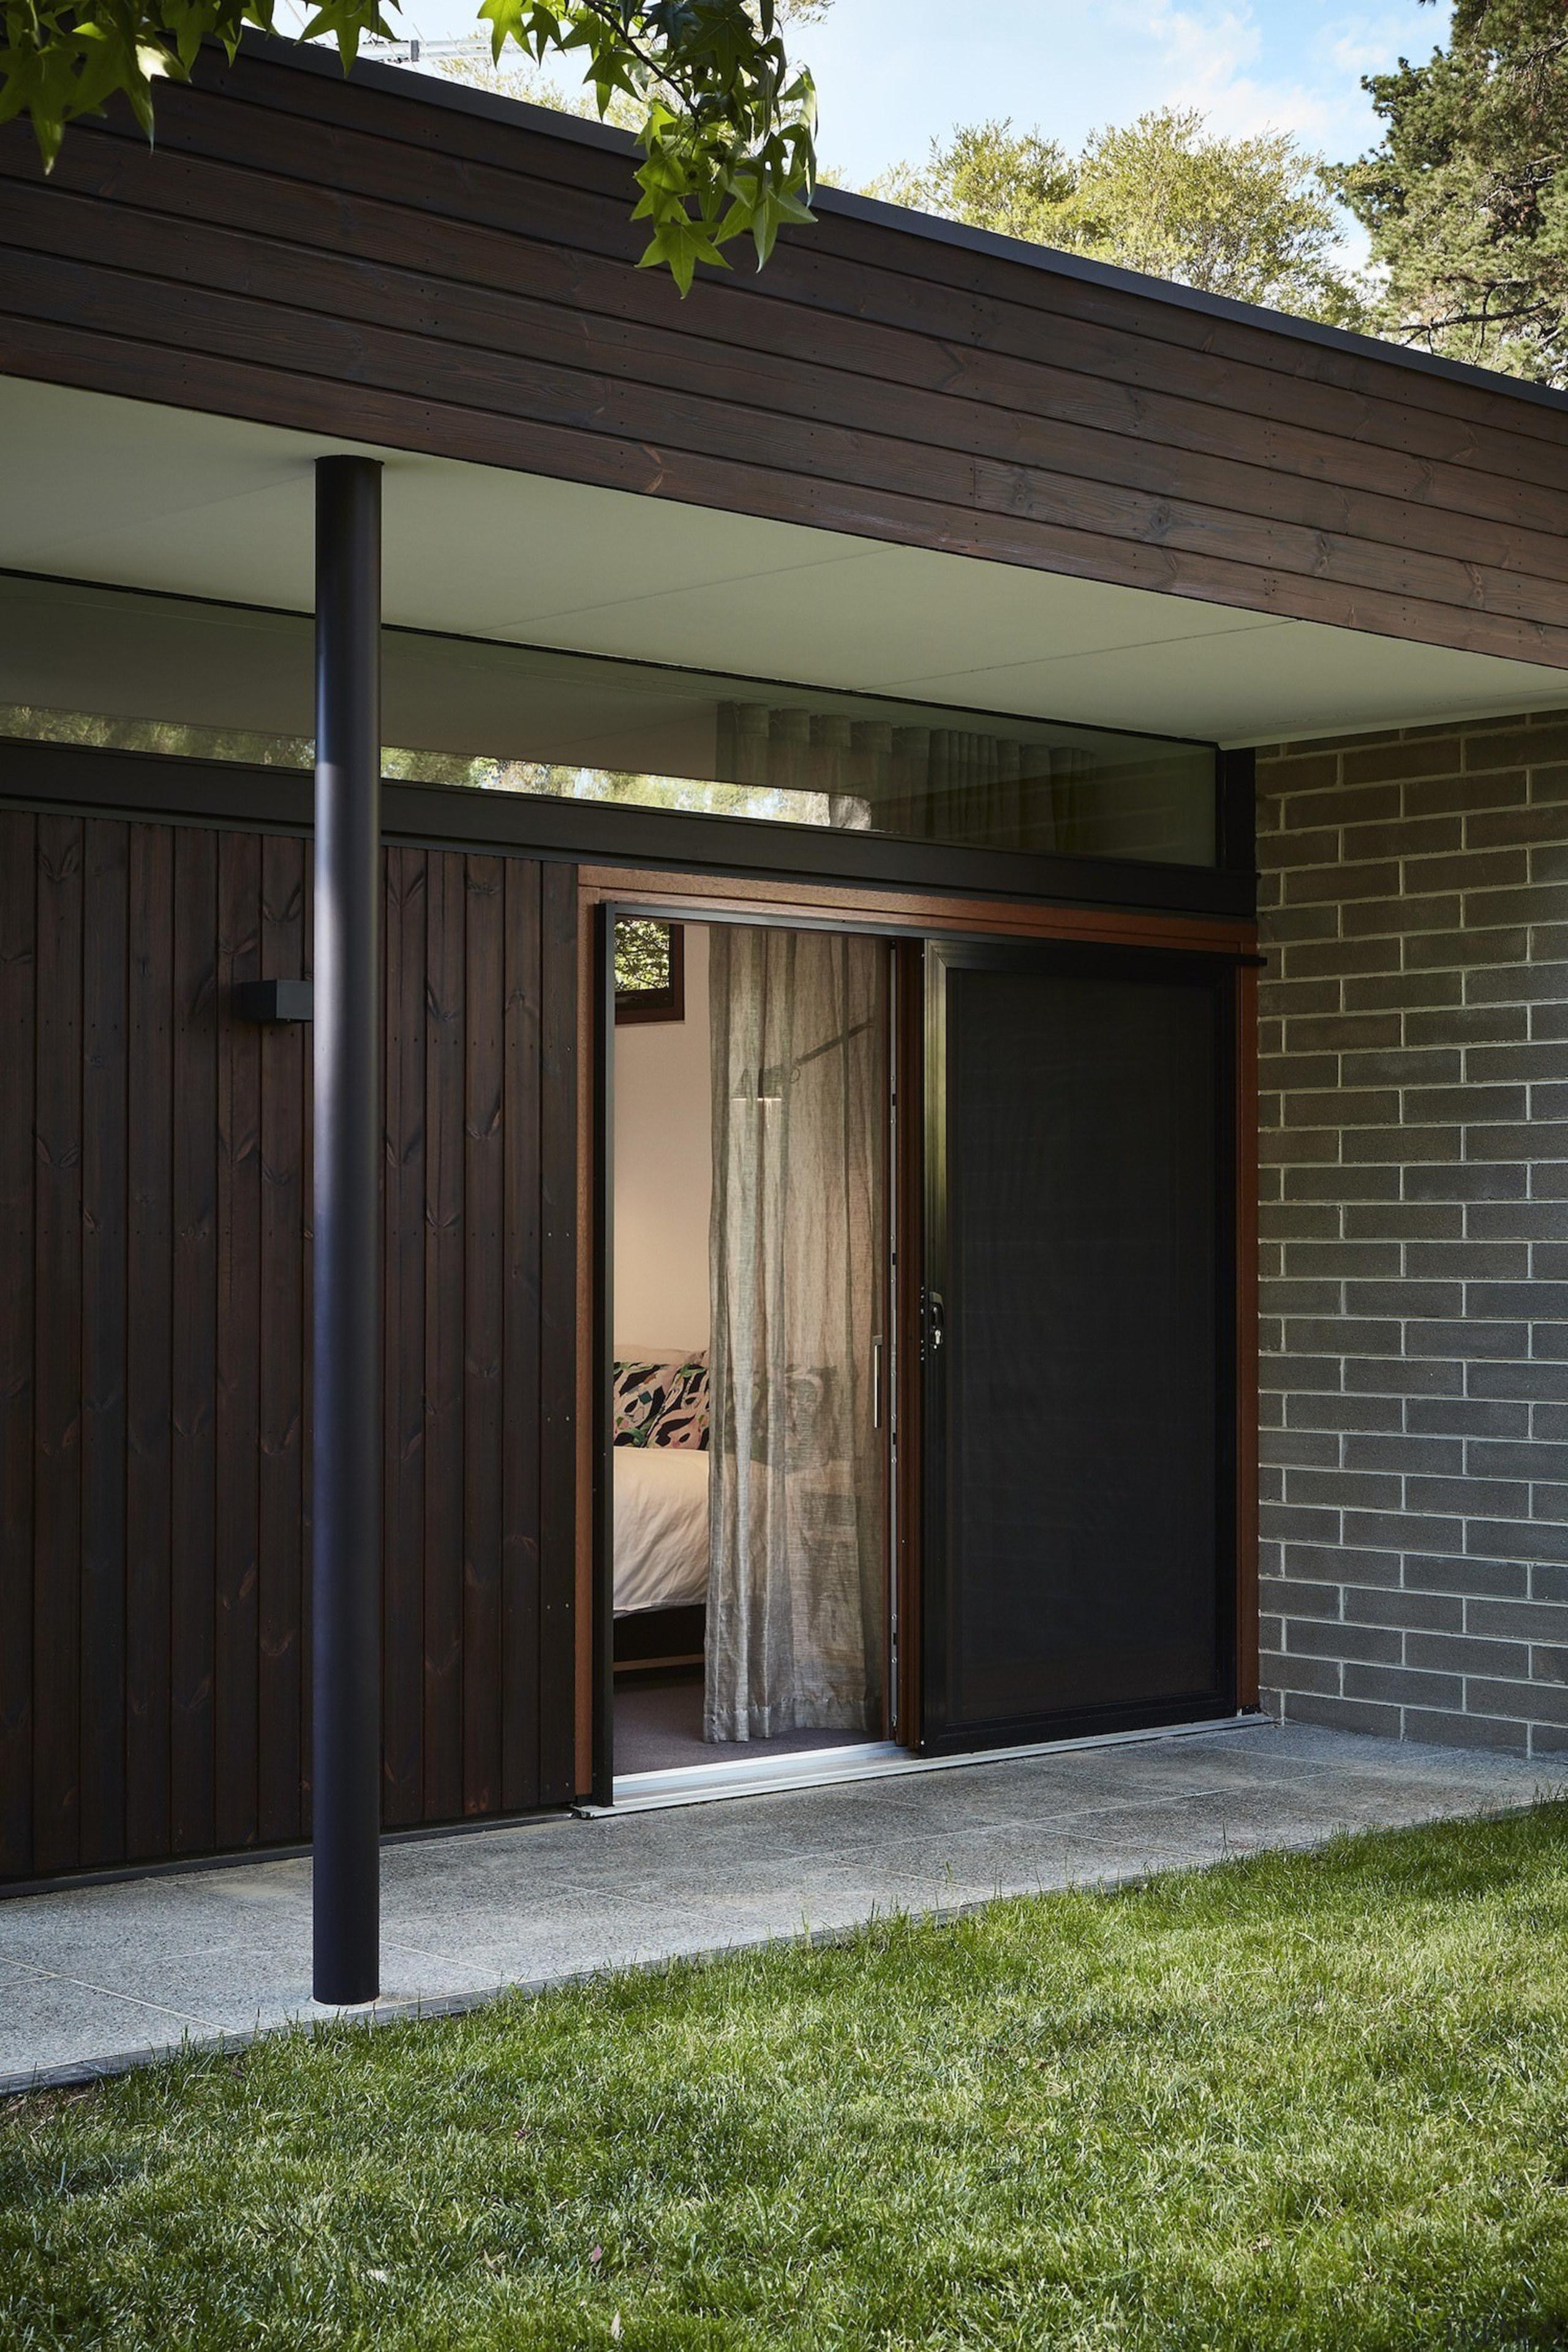 Architect: Architect: Steffen Welsch ArchitectsPhotography: Rhiannon architecture, door, facade, garage door, house, shed, siding, black